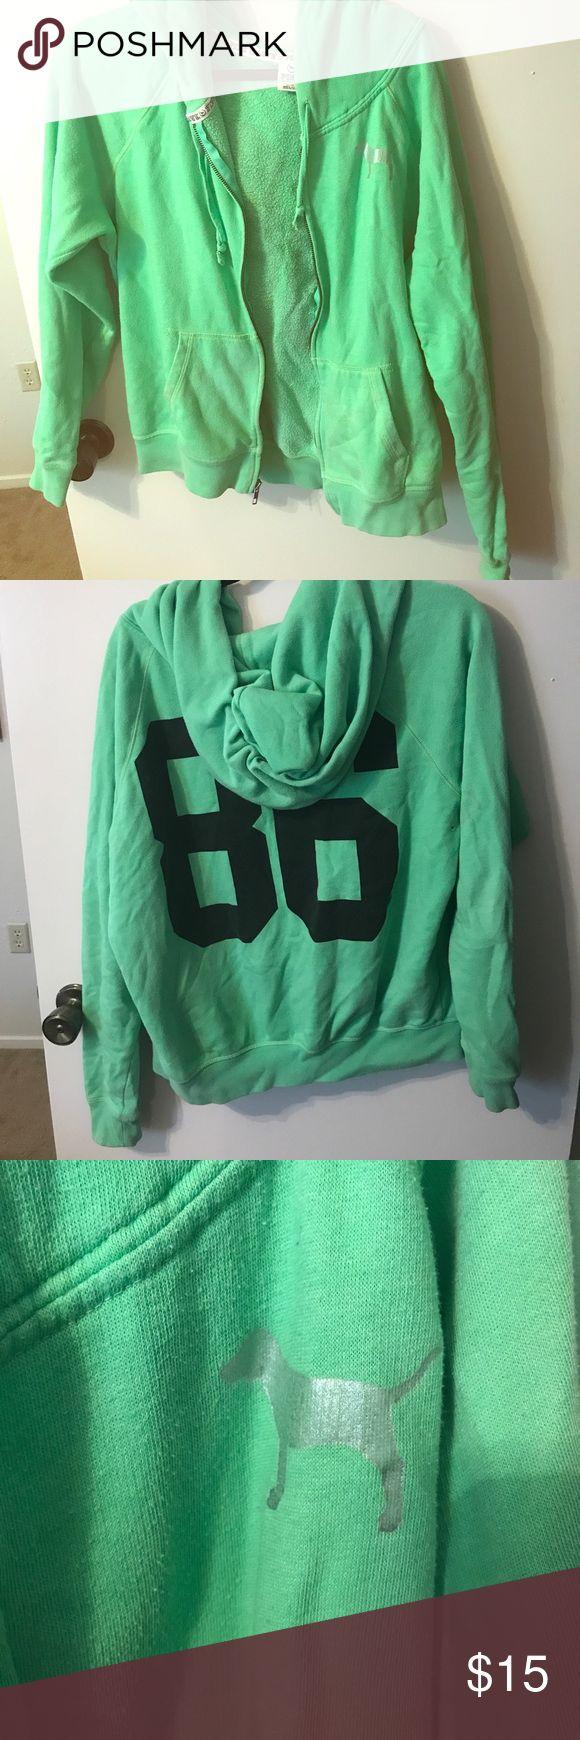 Victoria secret green zip up hoodie Bright green comfy zip up hoodie! The perfect light weight jacket PINK Victoria's Secret Jackets & Coats